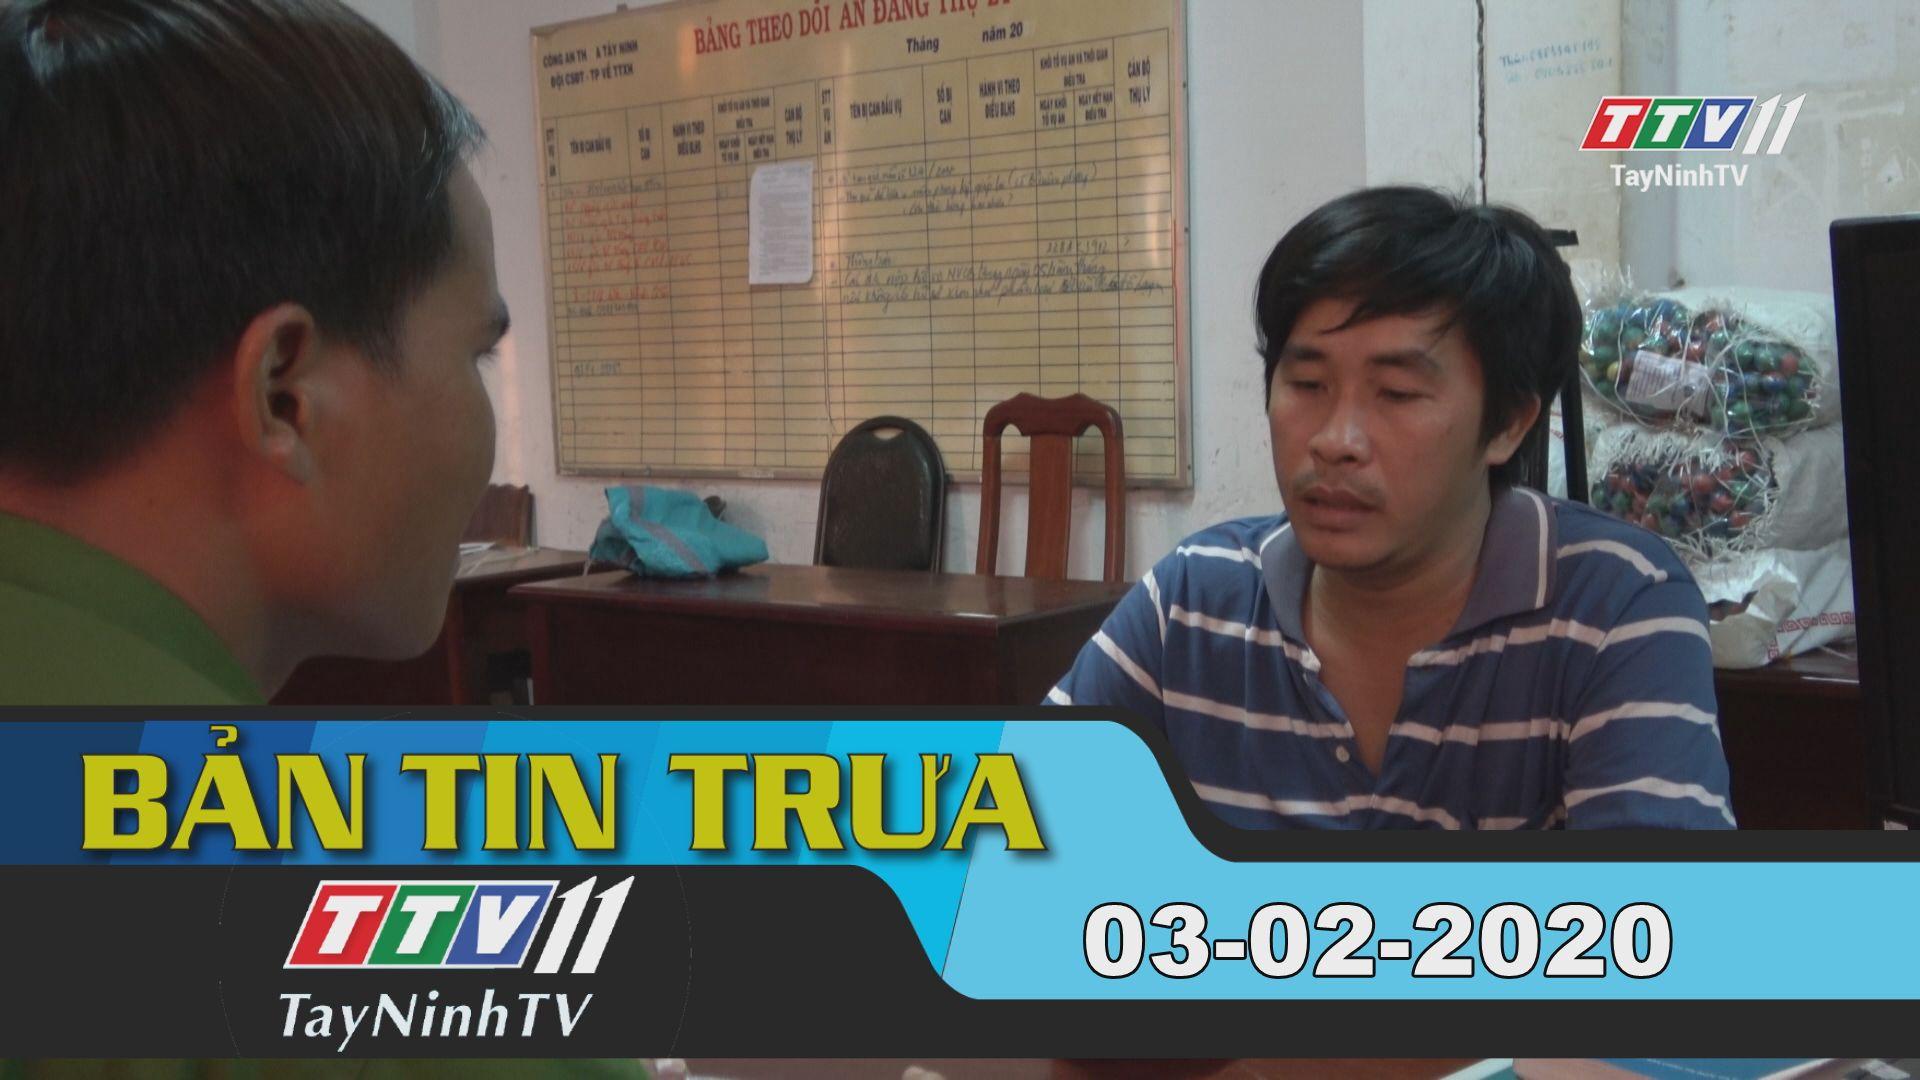 Bản tin trưa 03-02-2020 | Tin tức hôm nay | TayNinhTV